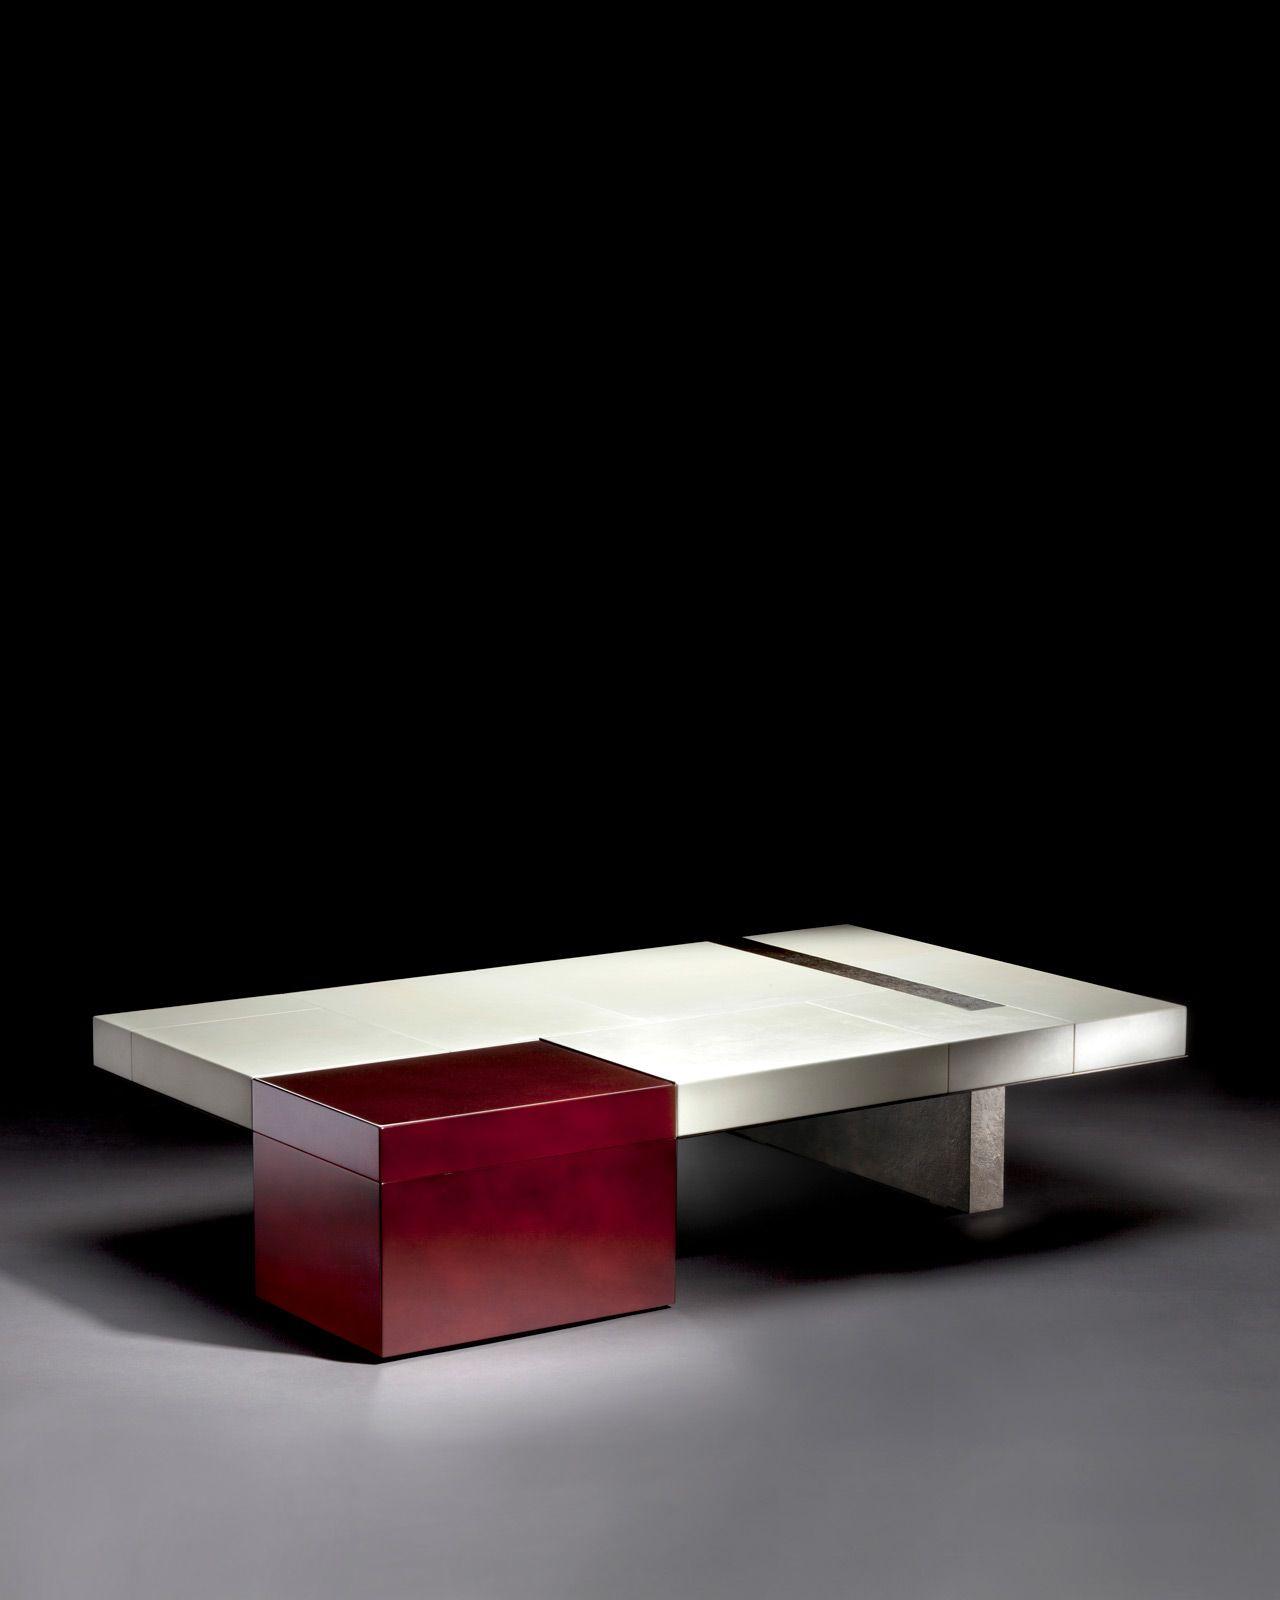 Table Basse Plateforme Herve Van Der Straeten Coffee Table Design Tea Table Coffe Table [ 1600 x 1280 Pixel ]